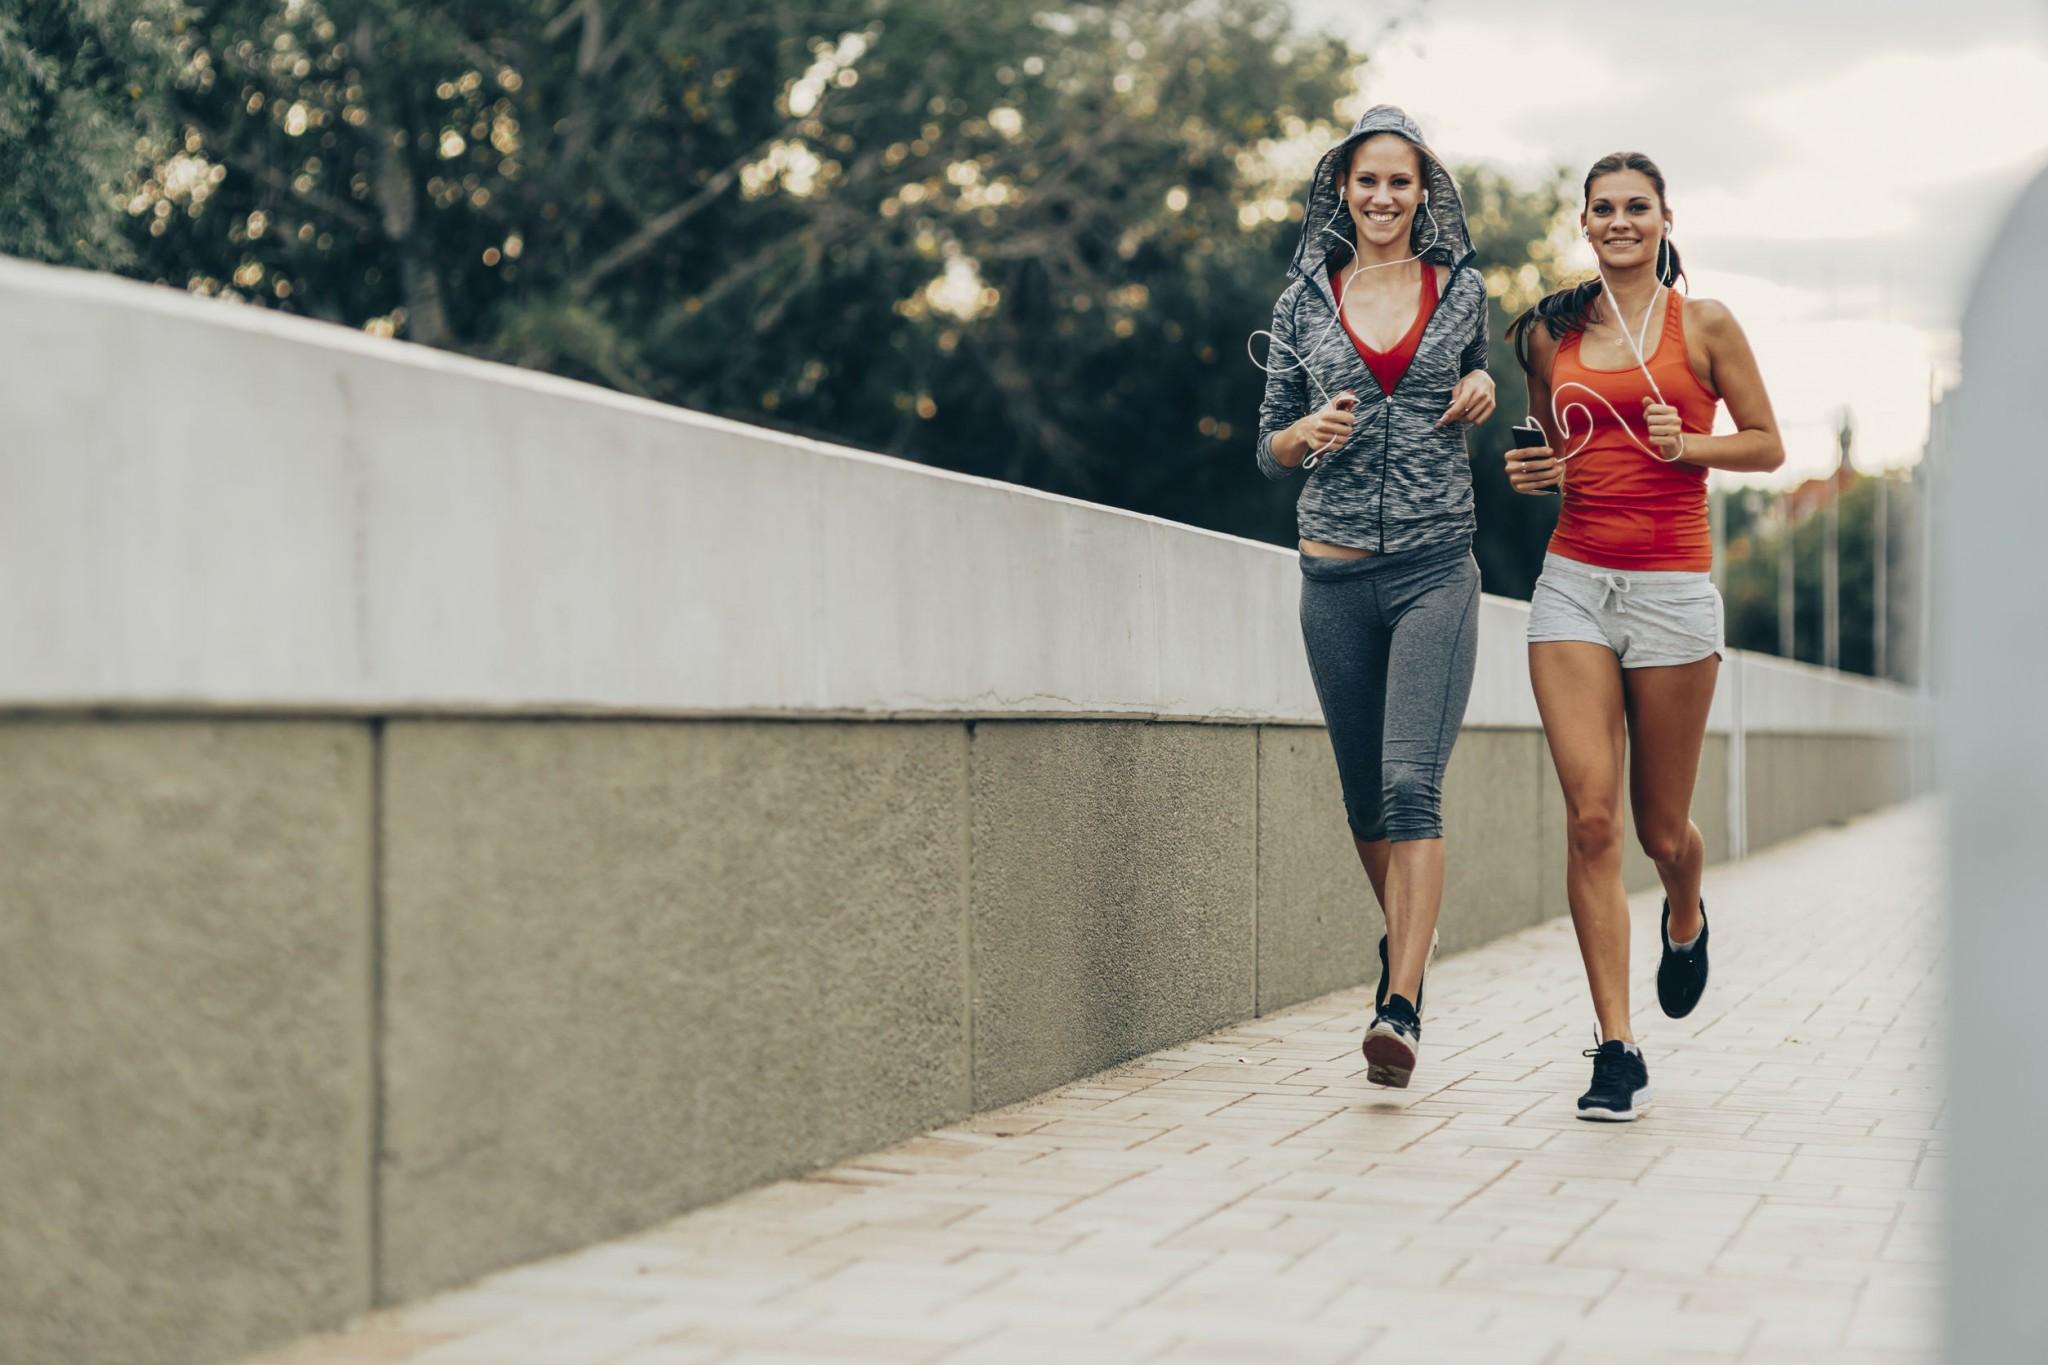 Beautiful women jogging in city while sun is setting down